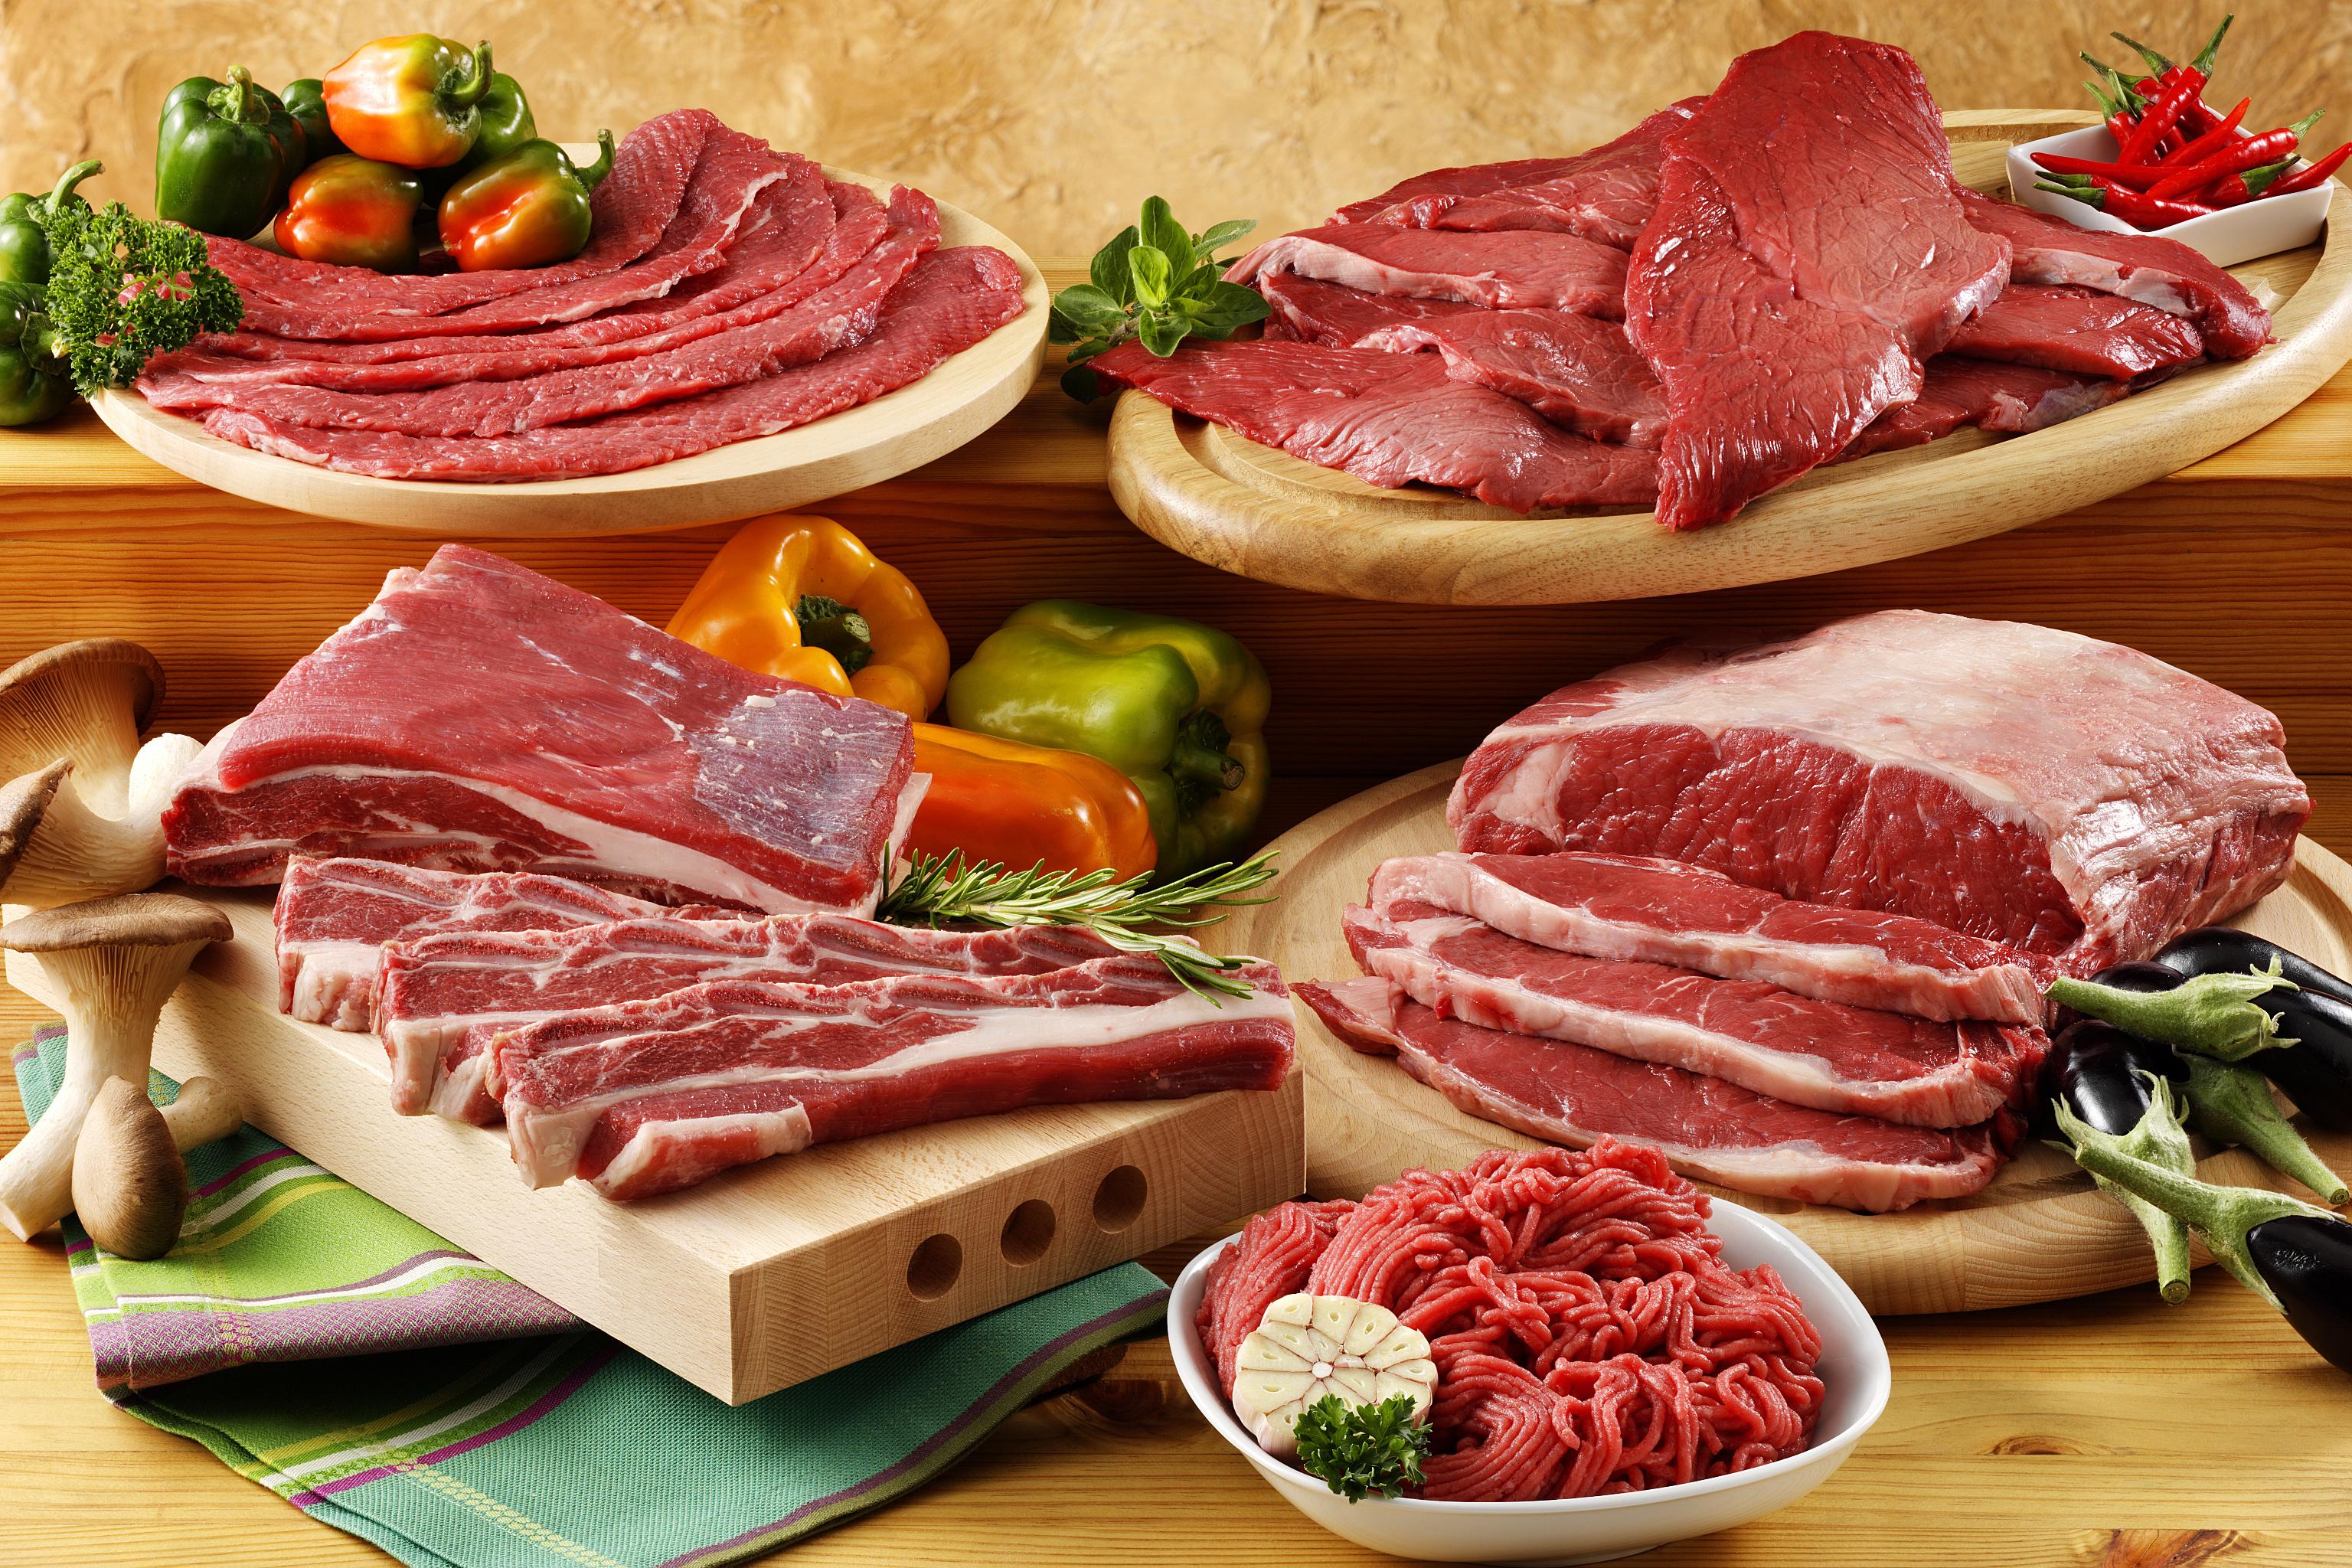 Buy organic beef - Buy Our Premium Beef